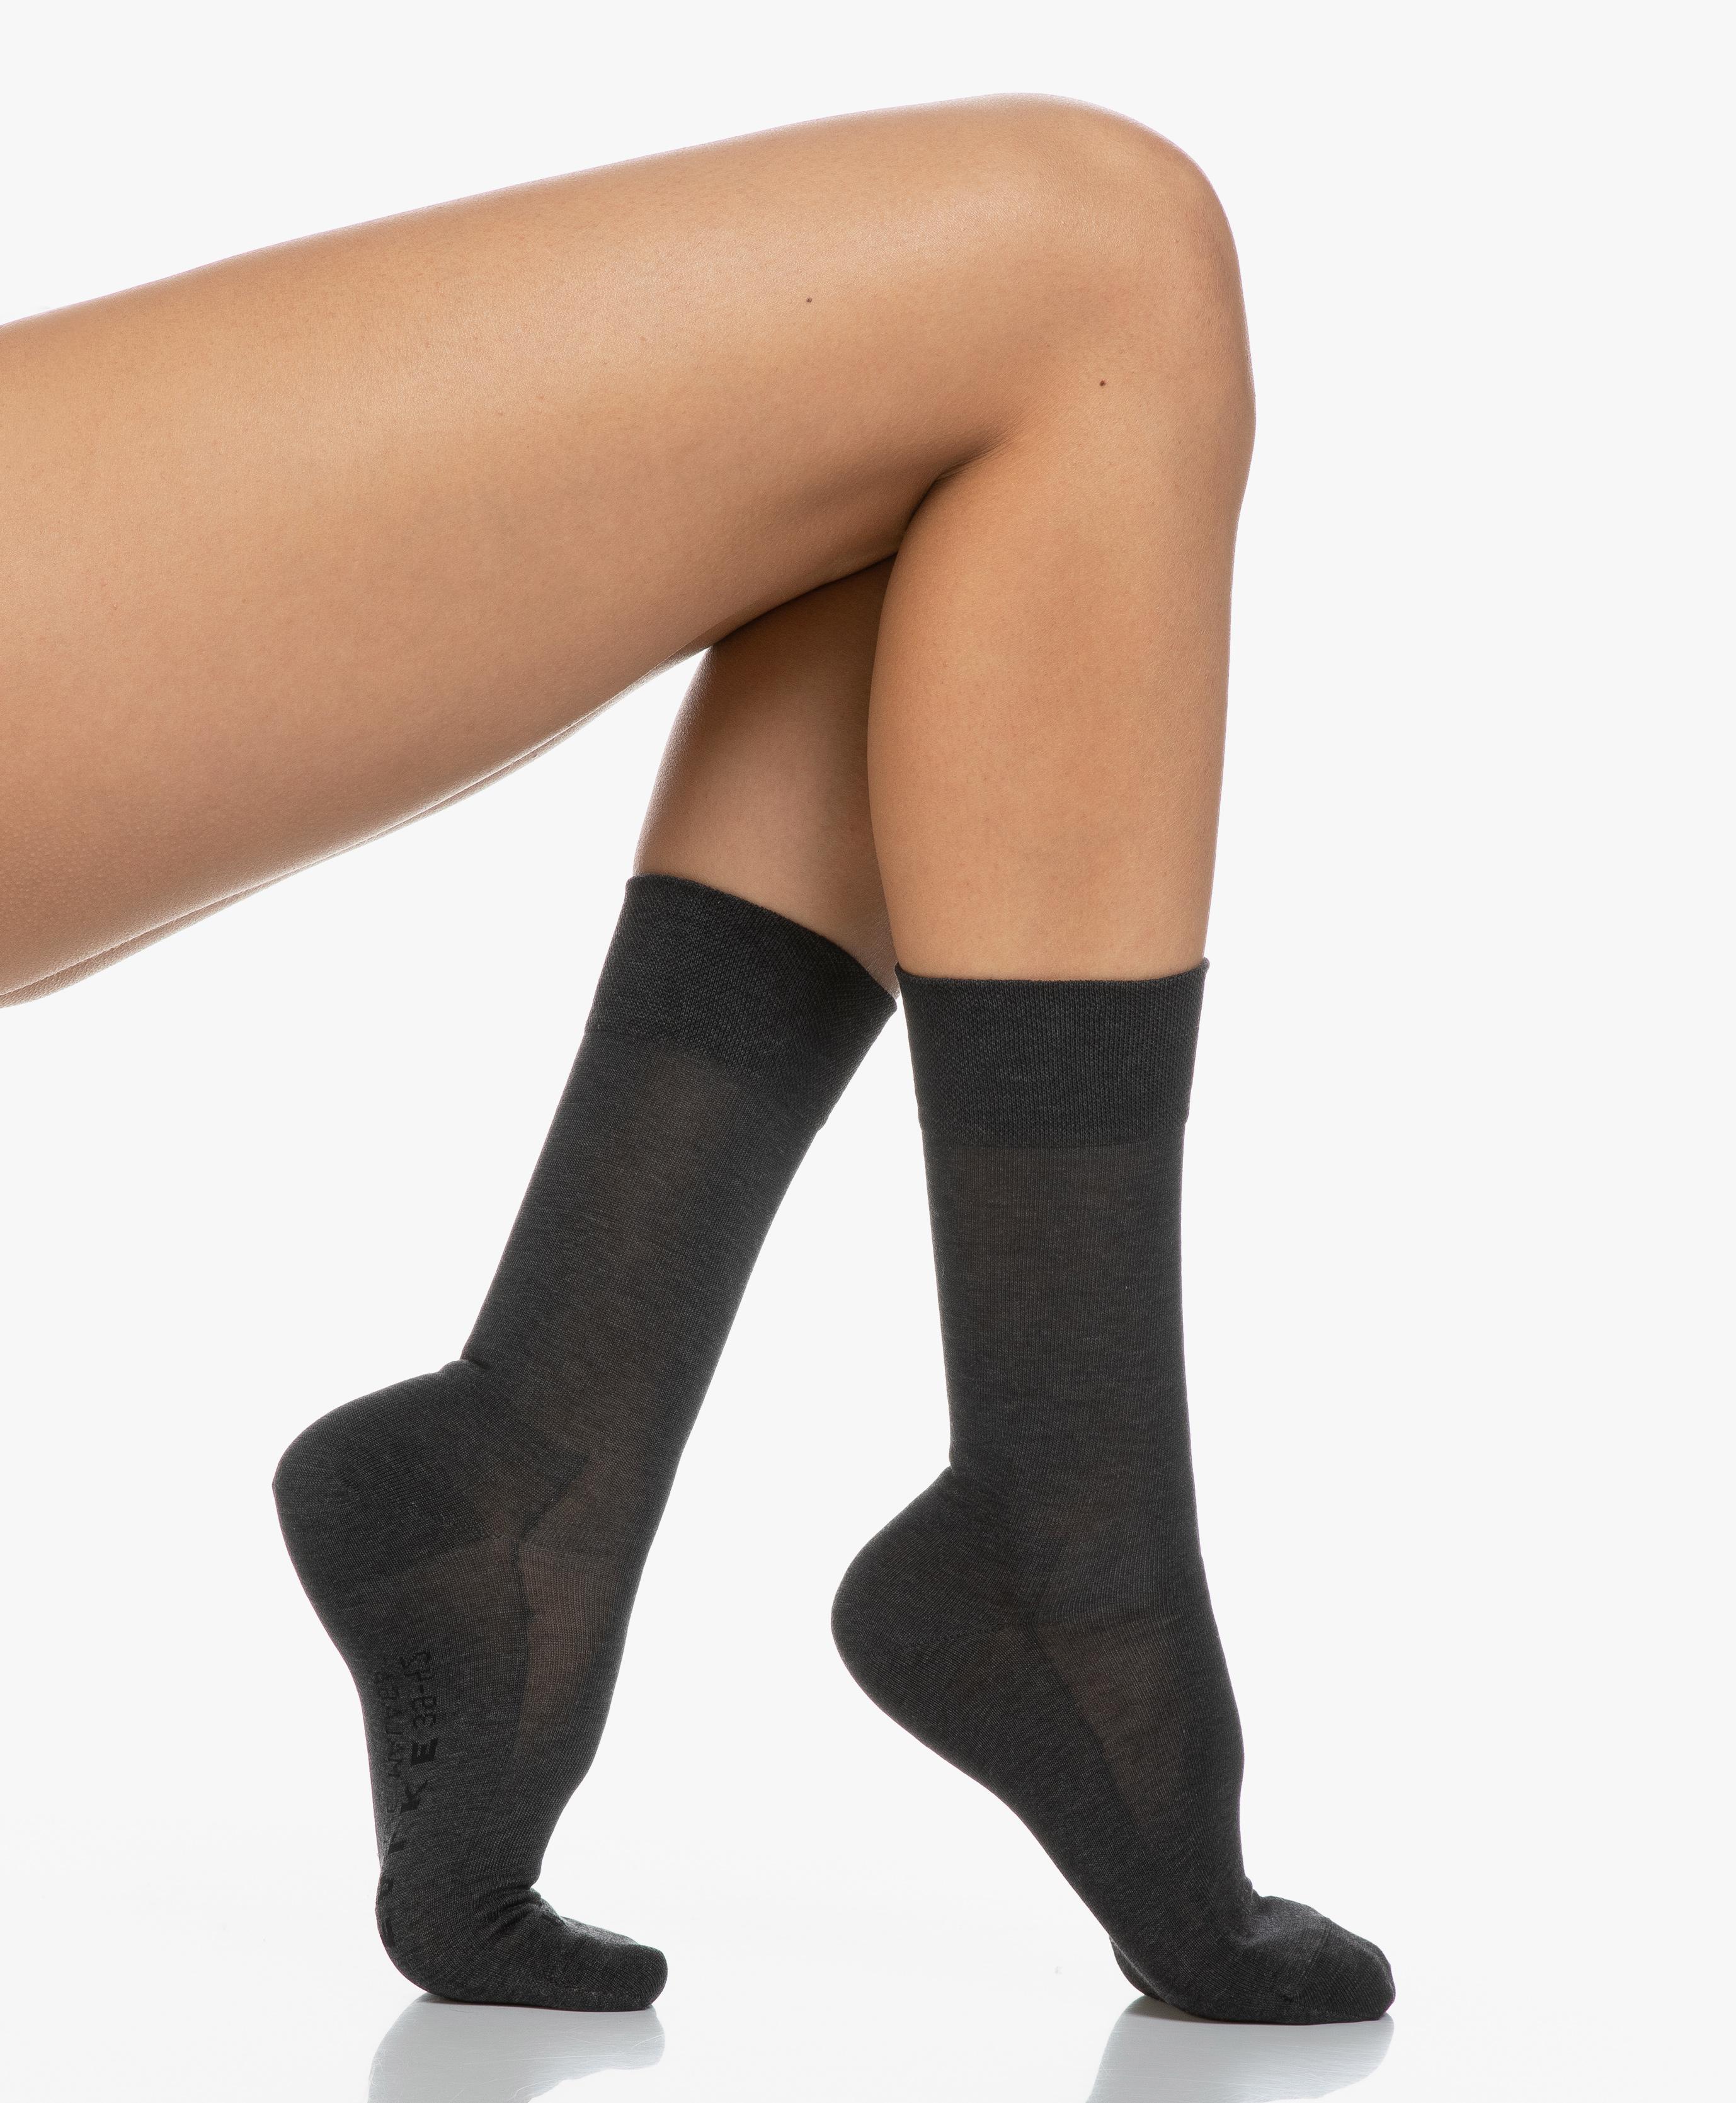 Falke Sensitive Malaga Socks Light Grey